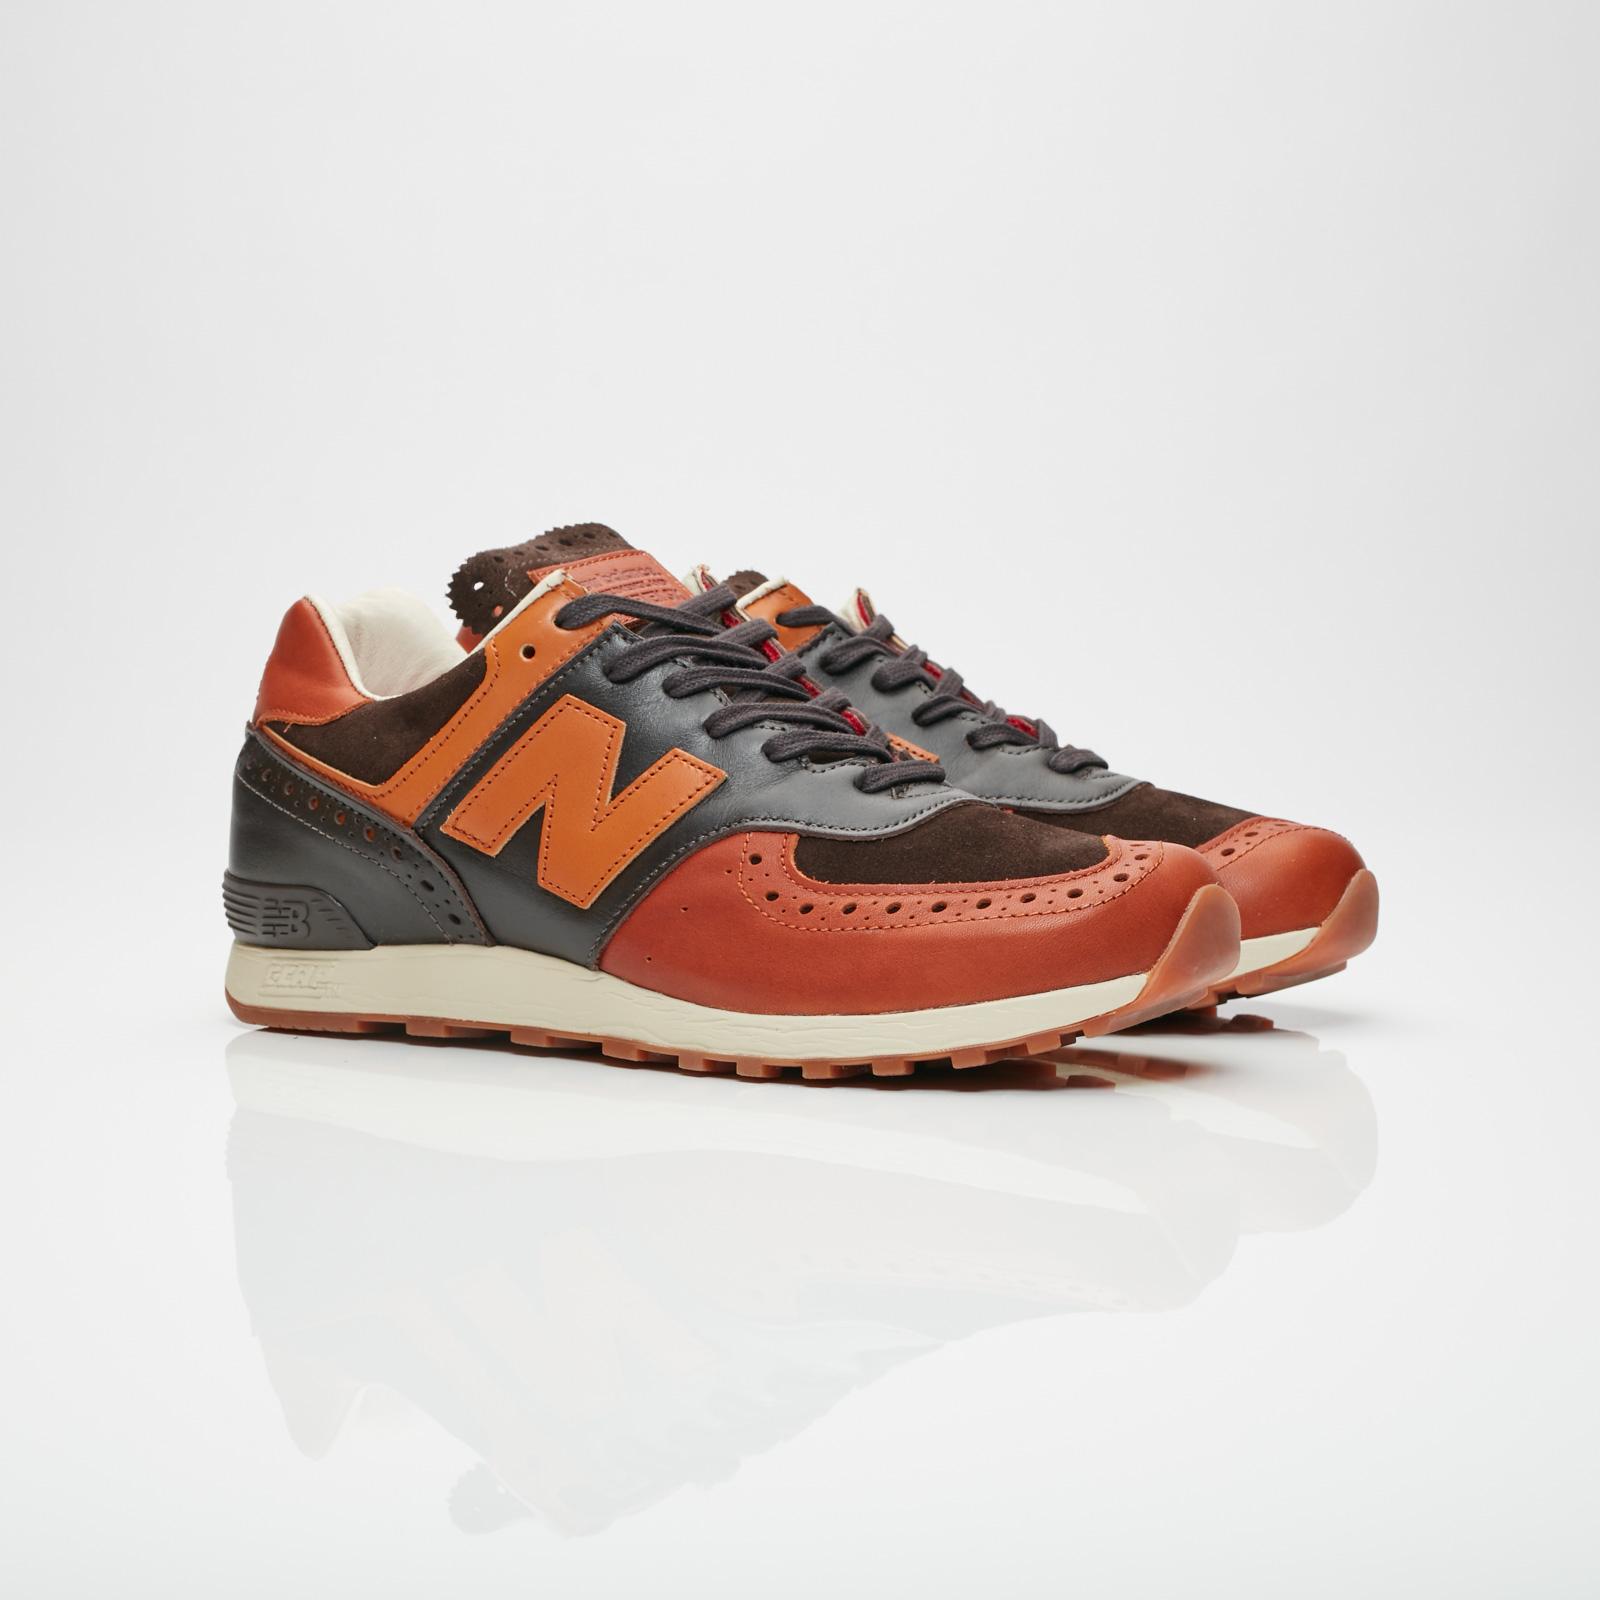 New Balance M576 x Grenson - M576gsn - SNS   sneakers & streetwear ...